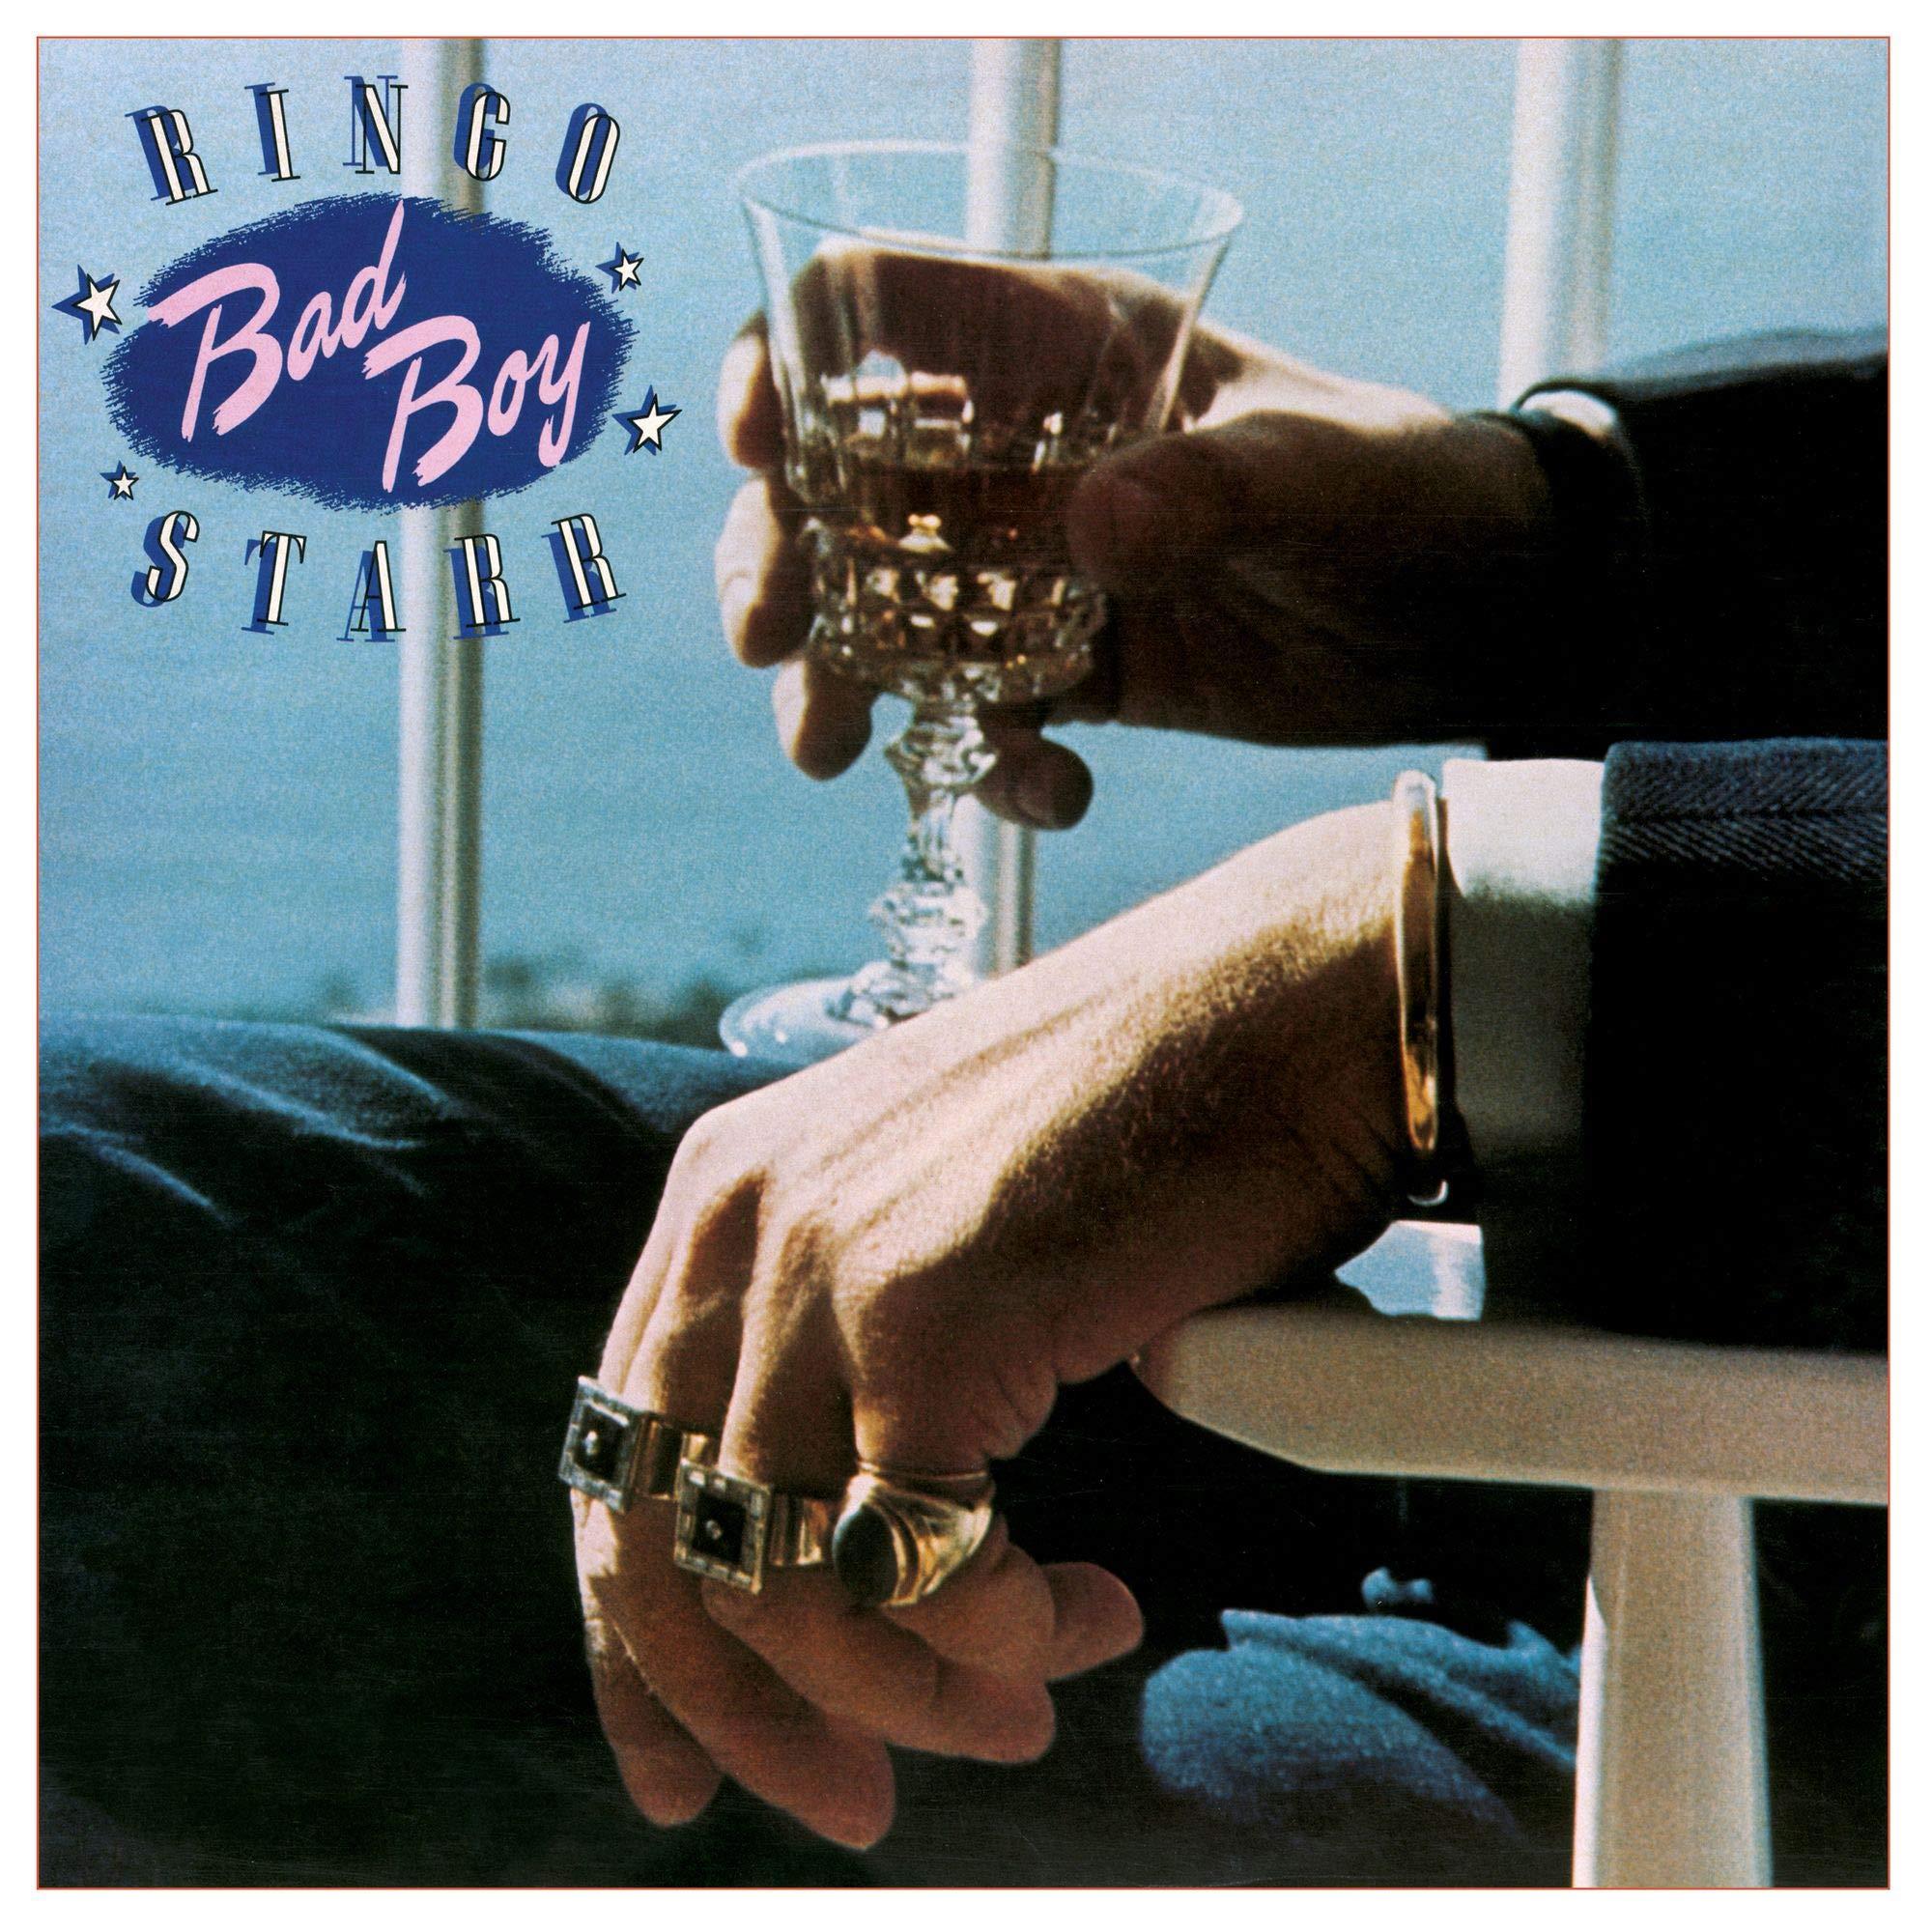 Vinilo : Ringo Starr - Bad Boy (180 Gram Vinyl, Gatefold LP Jacket, Limited Edition, Poster)